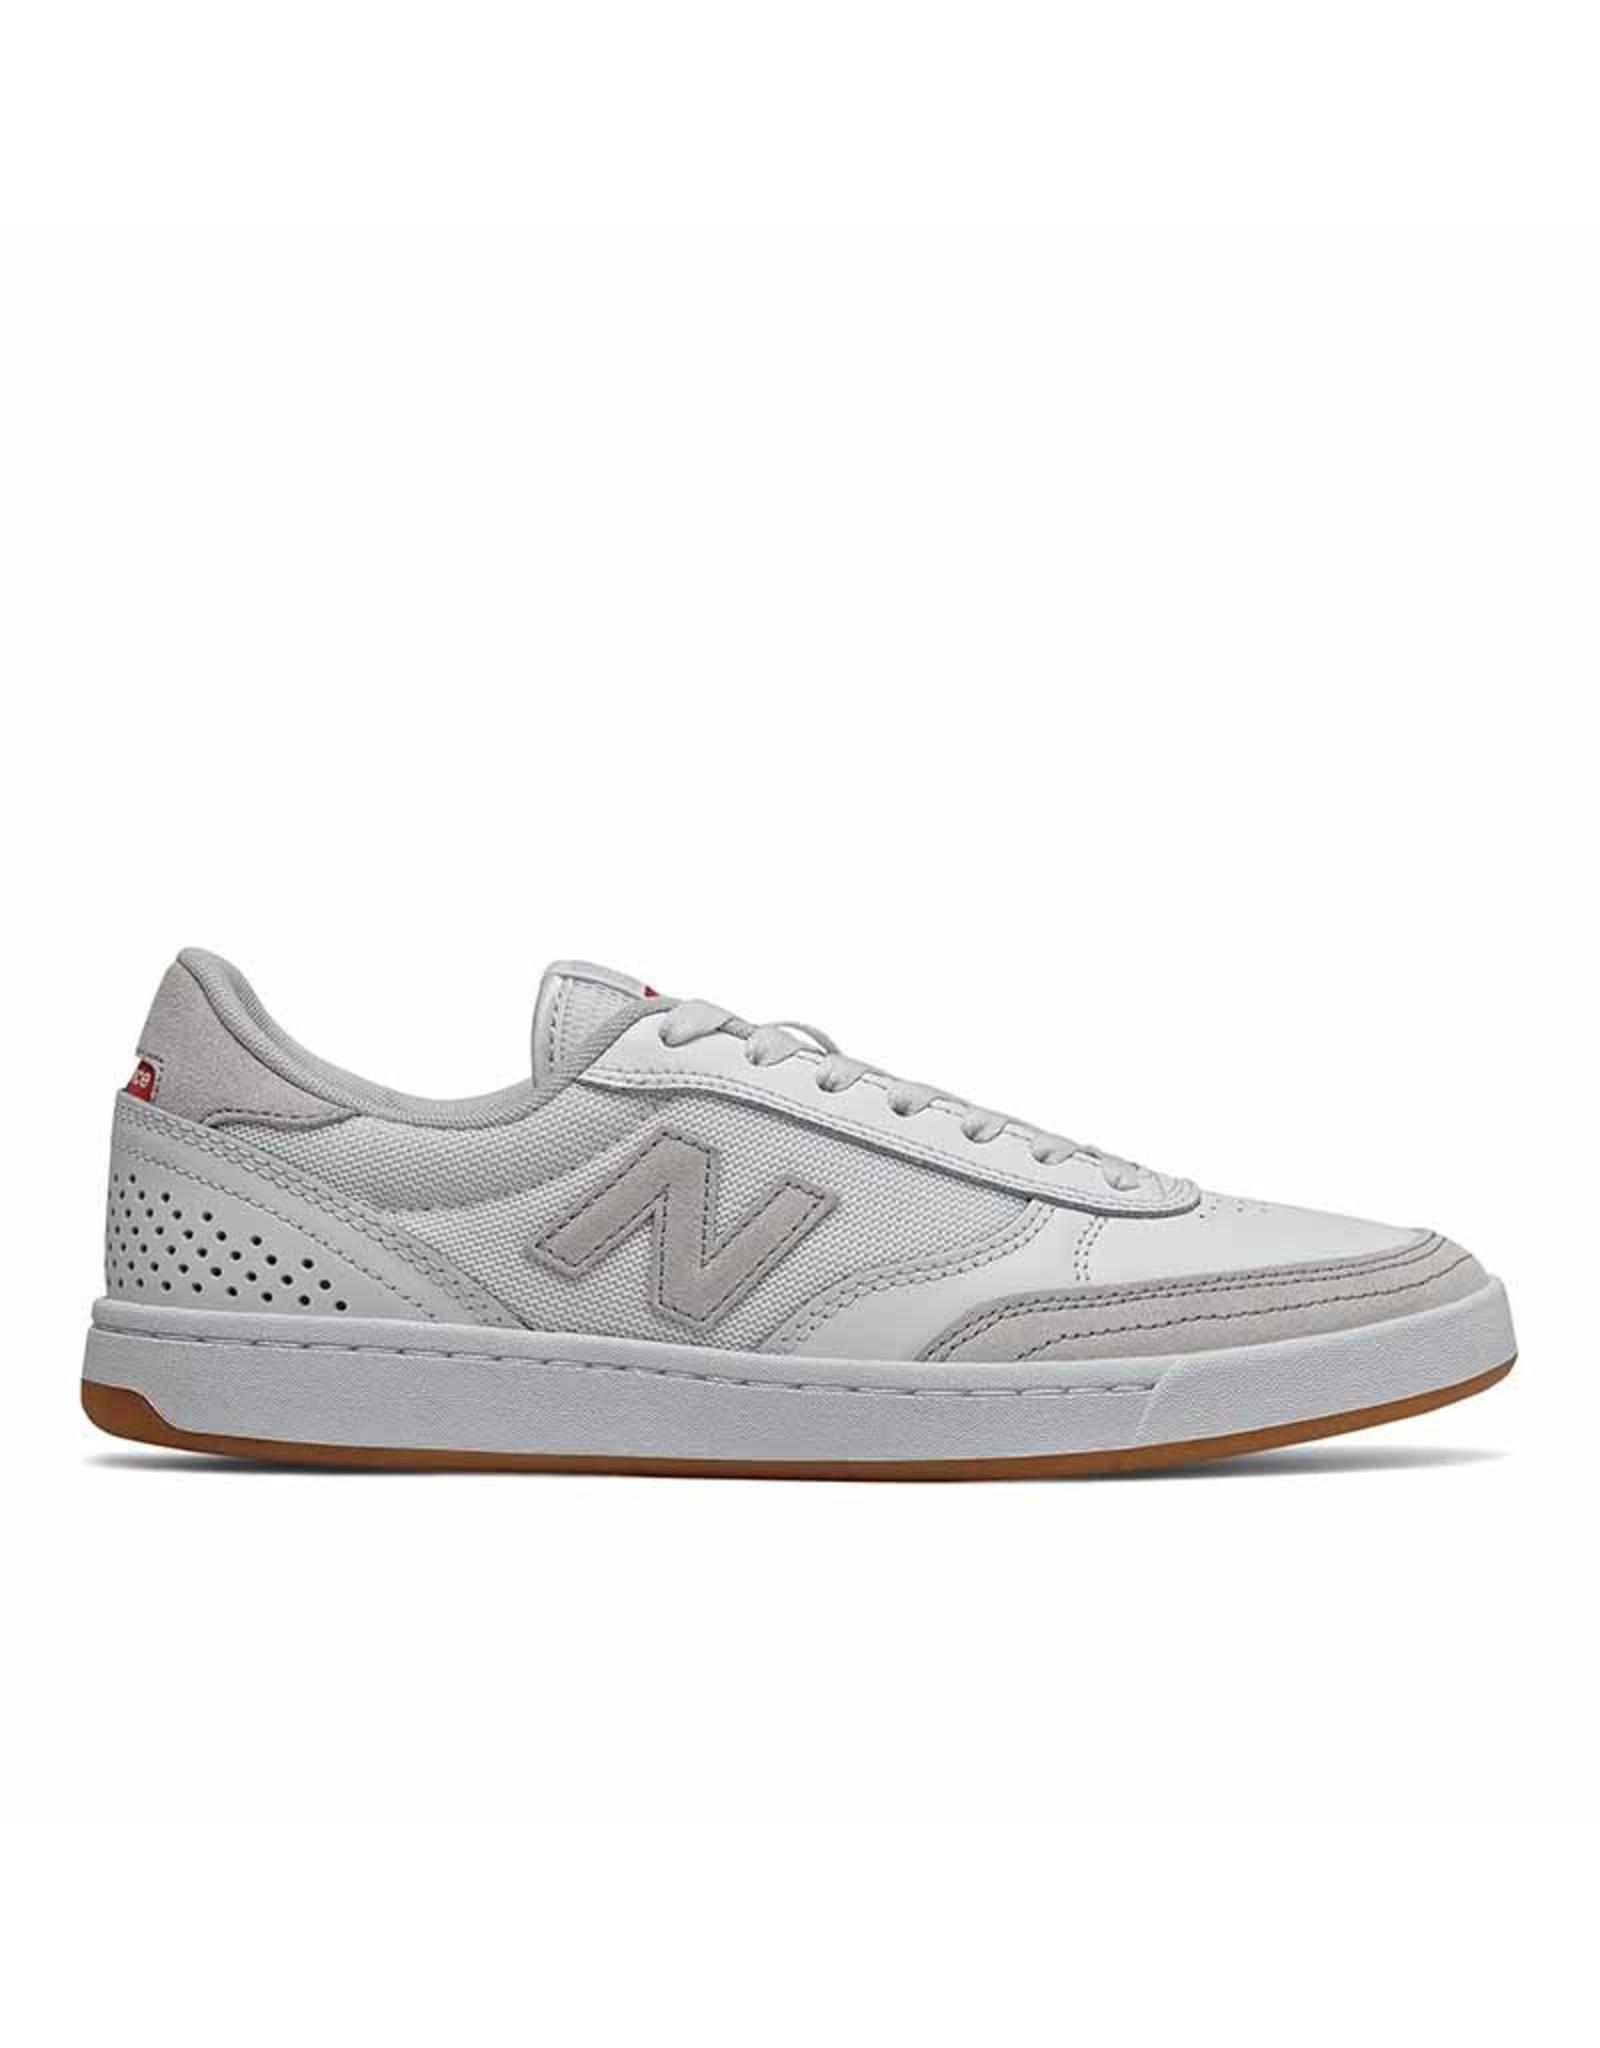 NEW BALANCE NEW BALANCE - 440 - WHITE/WHITE